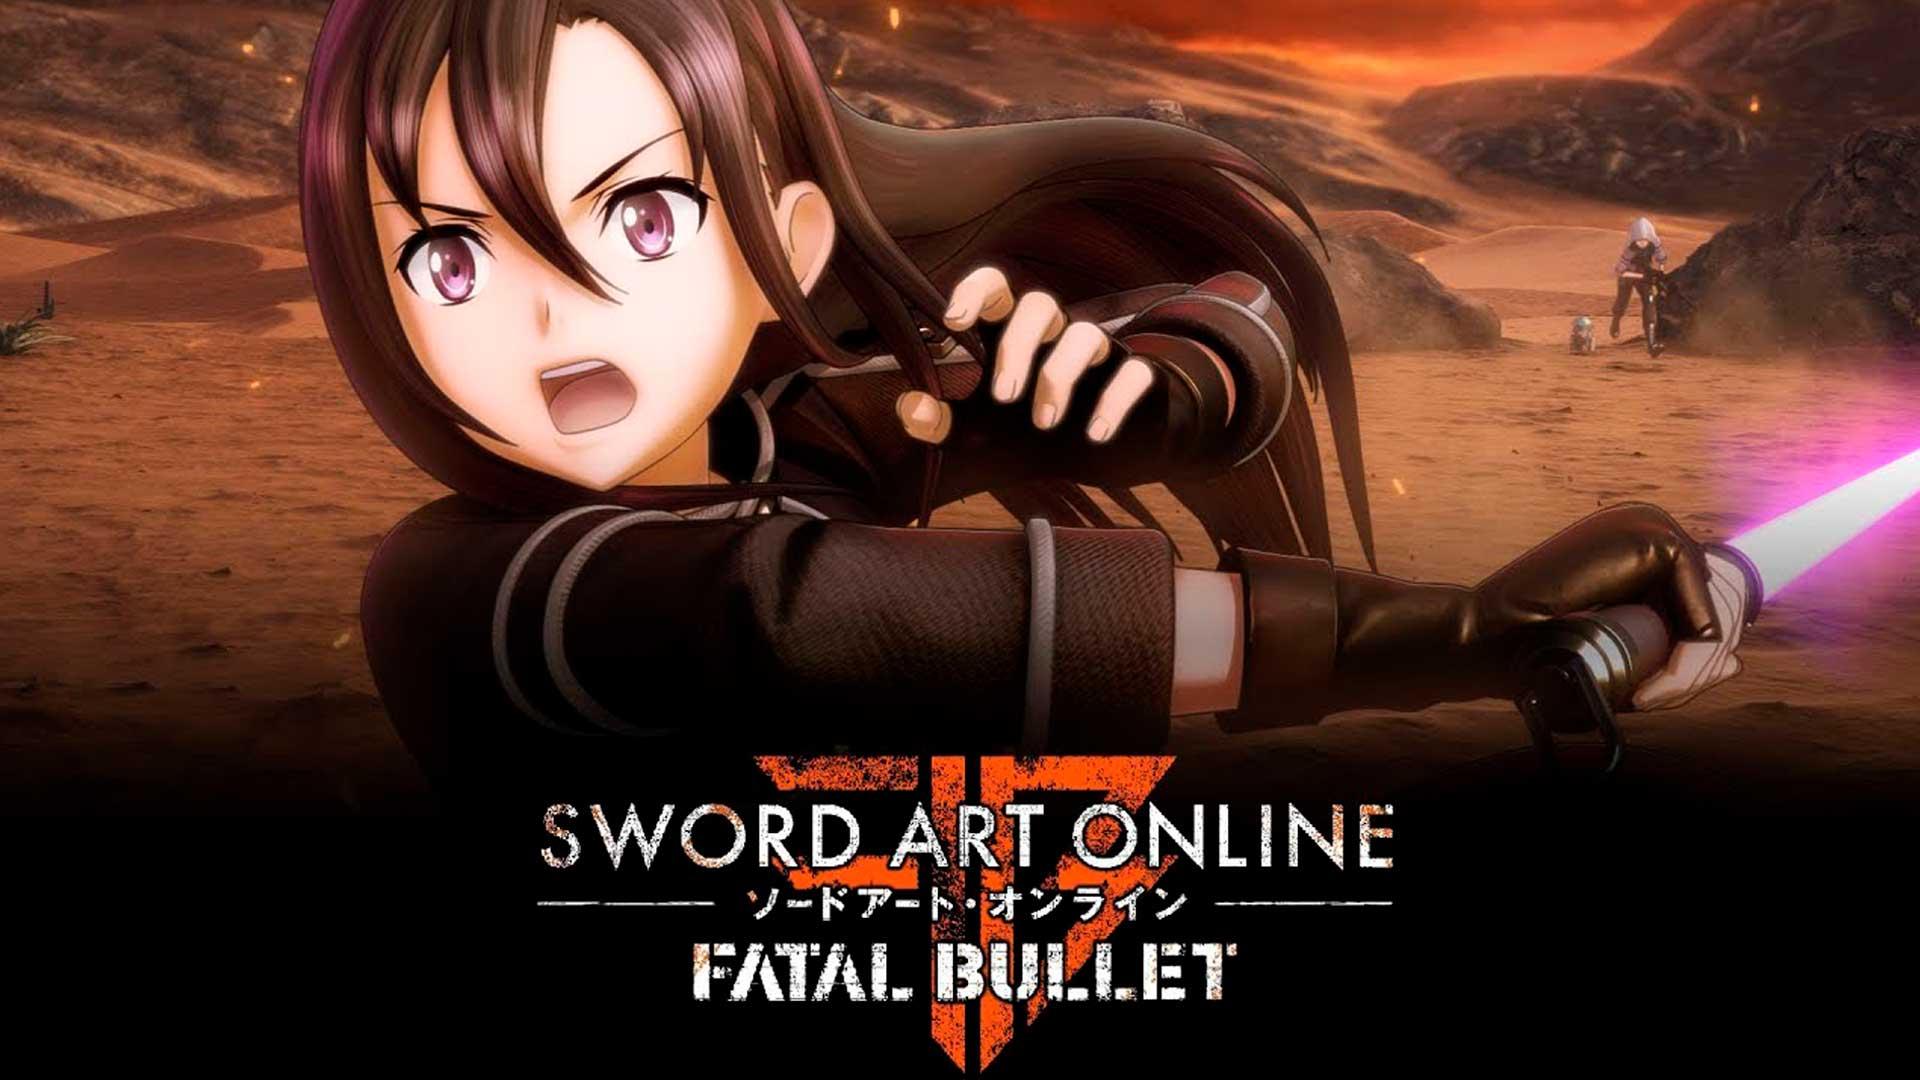 Sword Art Online Fatal Bullet Wallpapers Wallpaper Cave